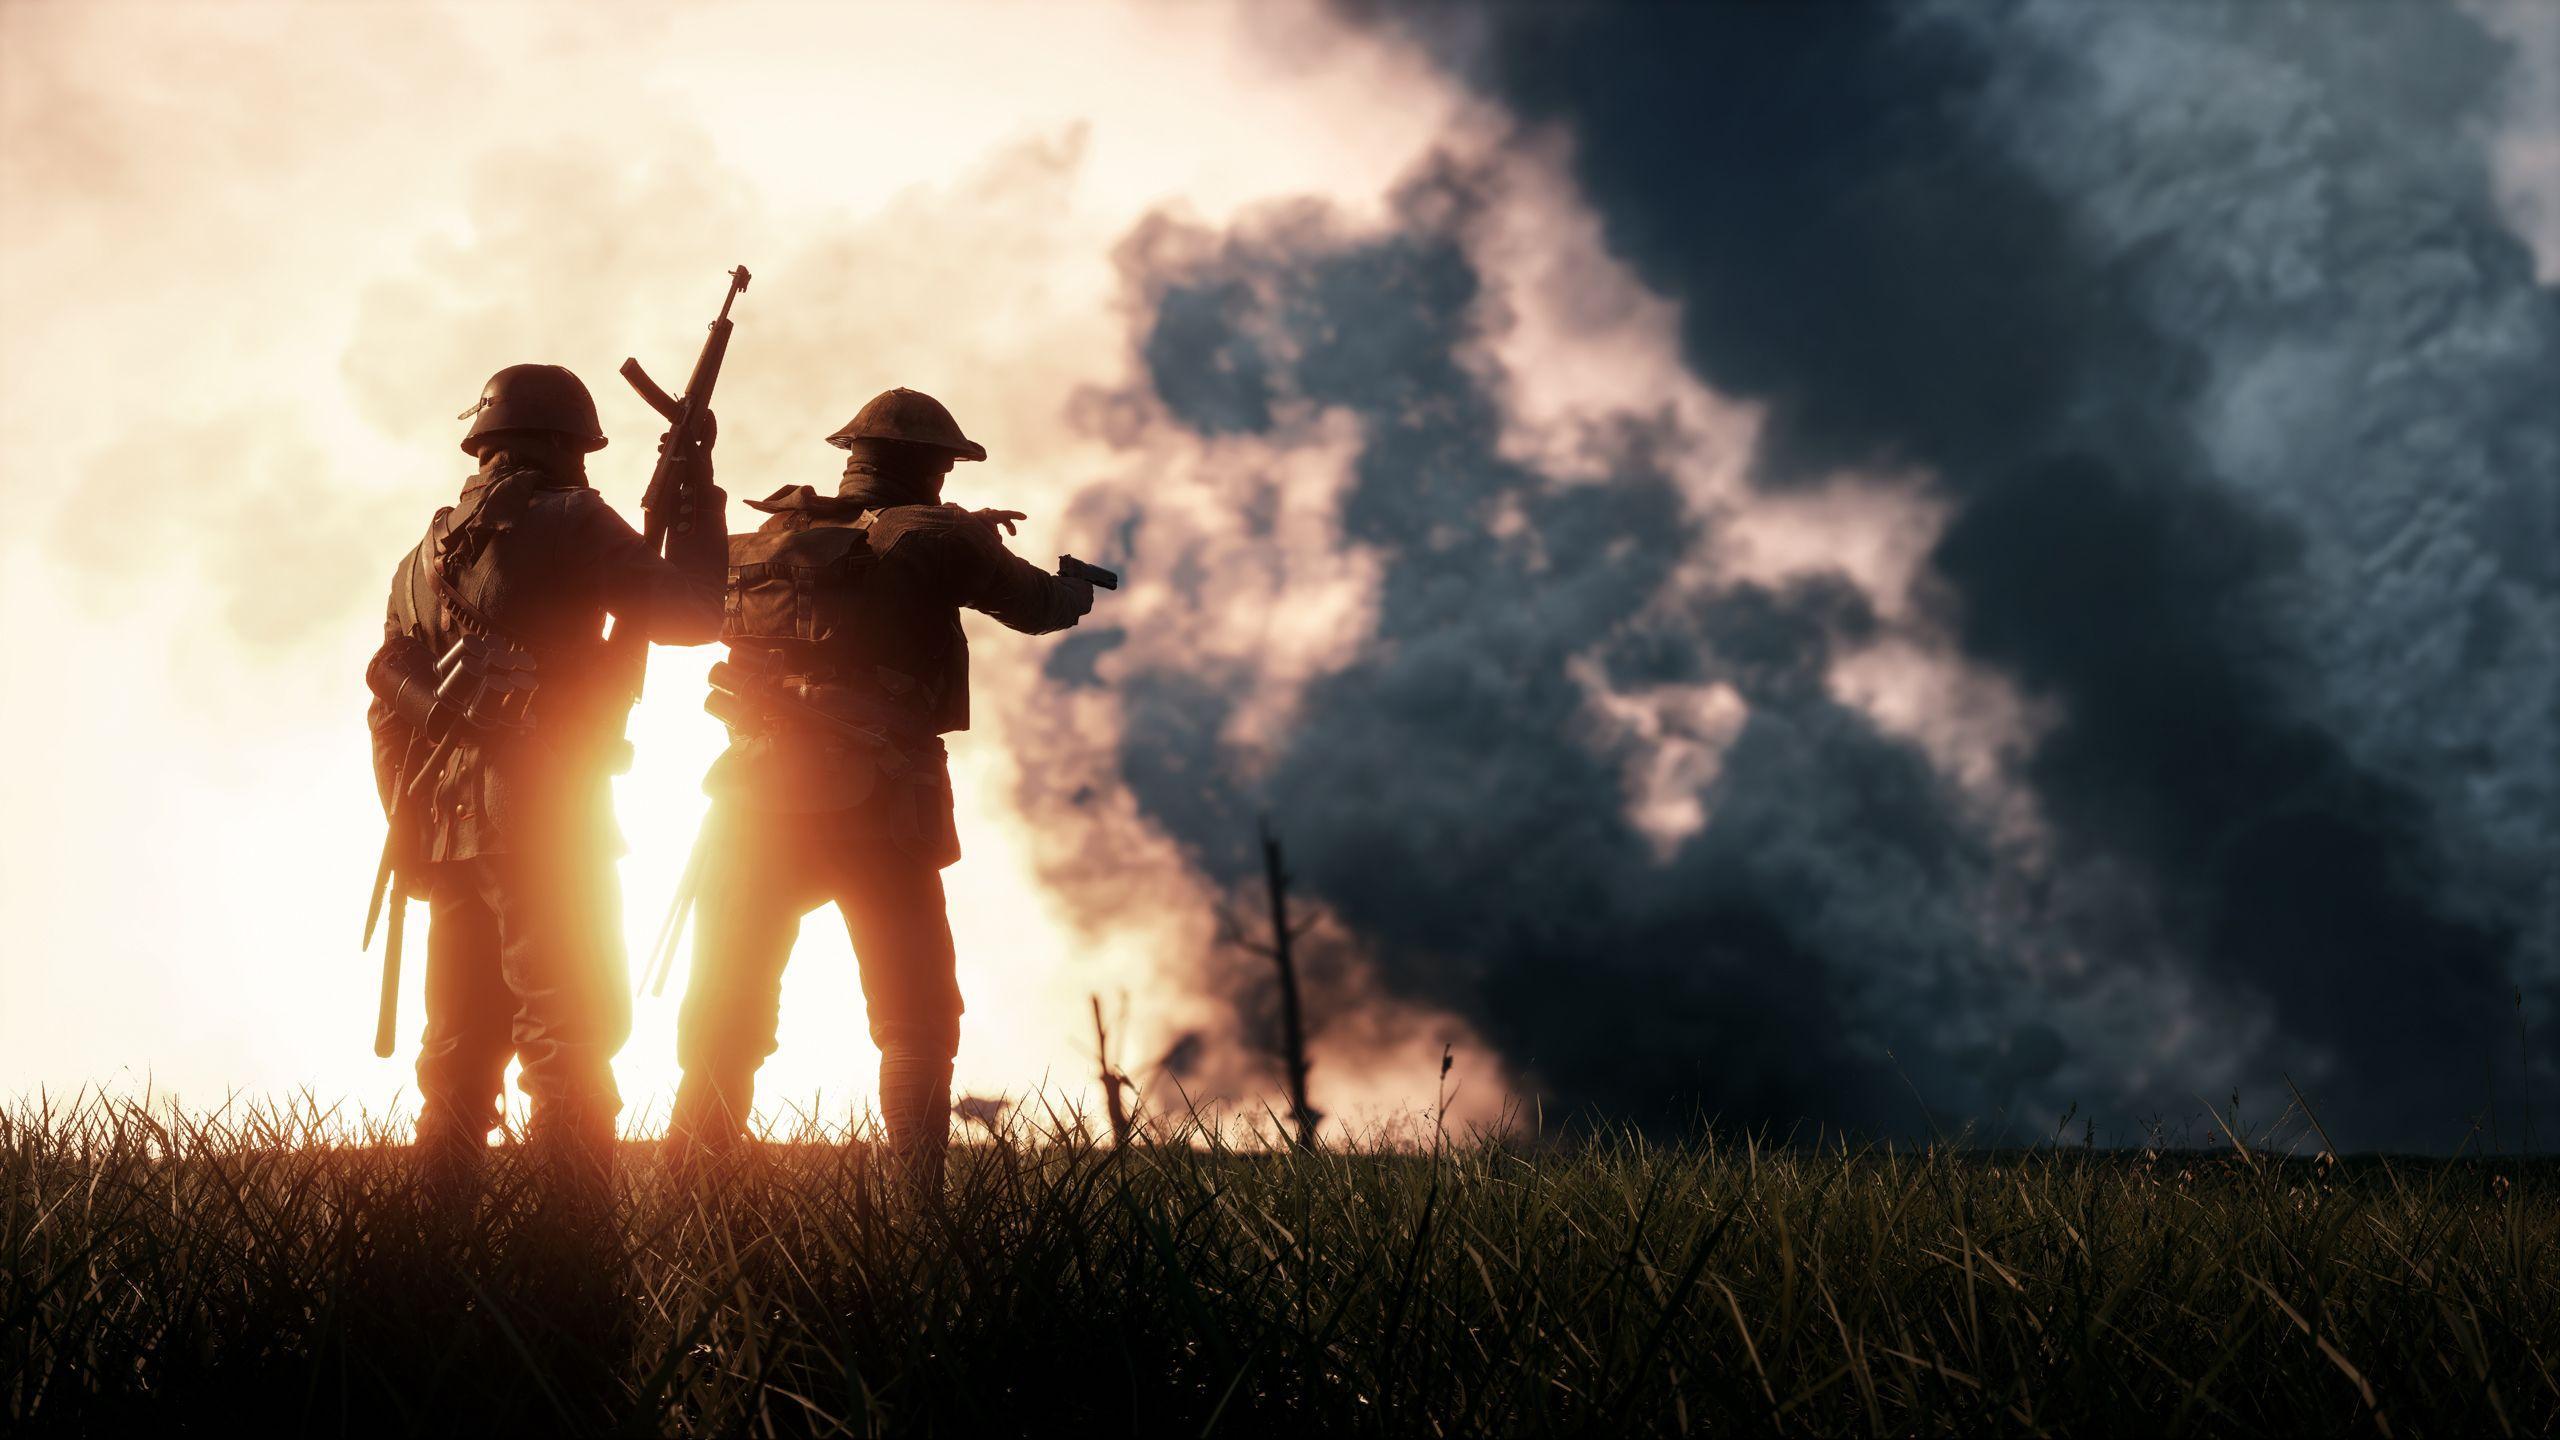 Battlefield 1 Wallpapers - Wallpaper Cave